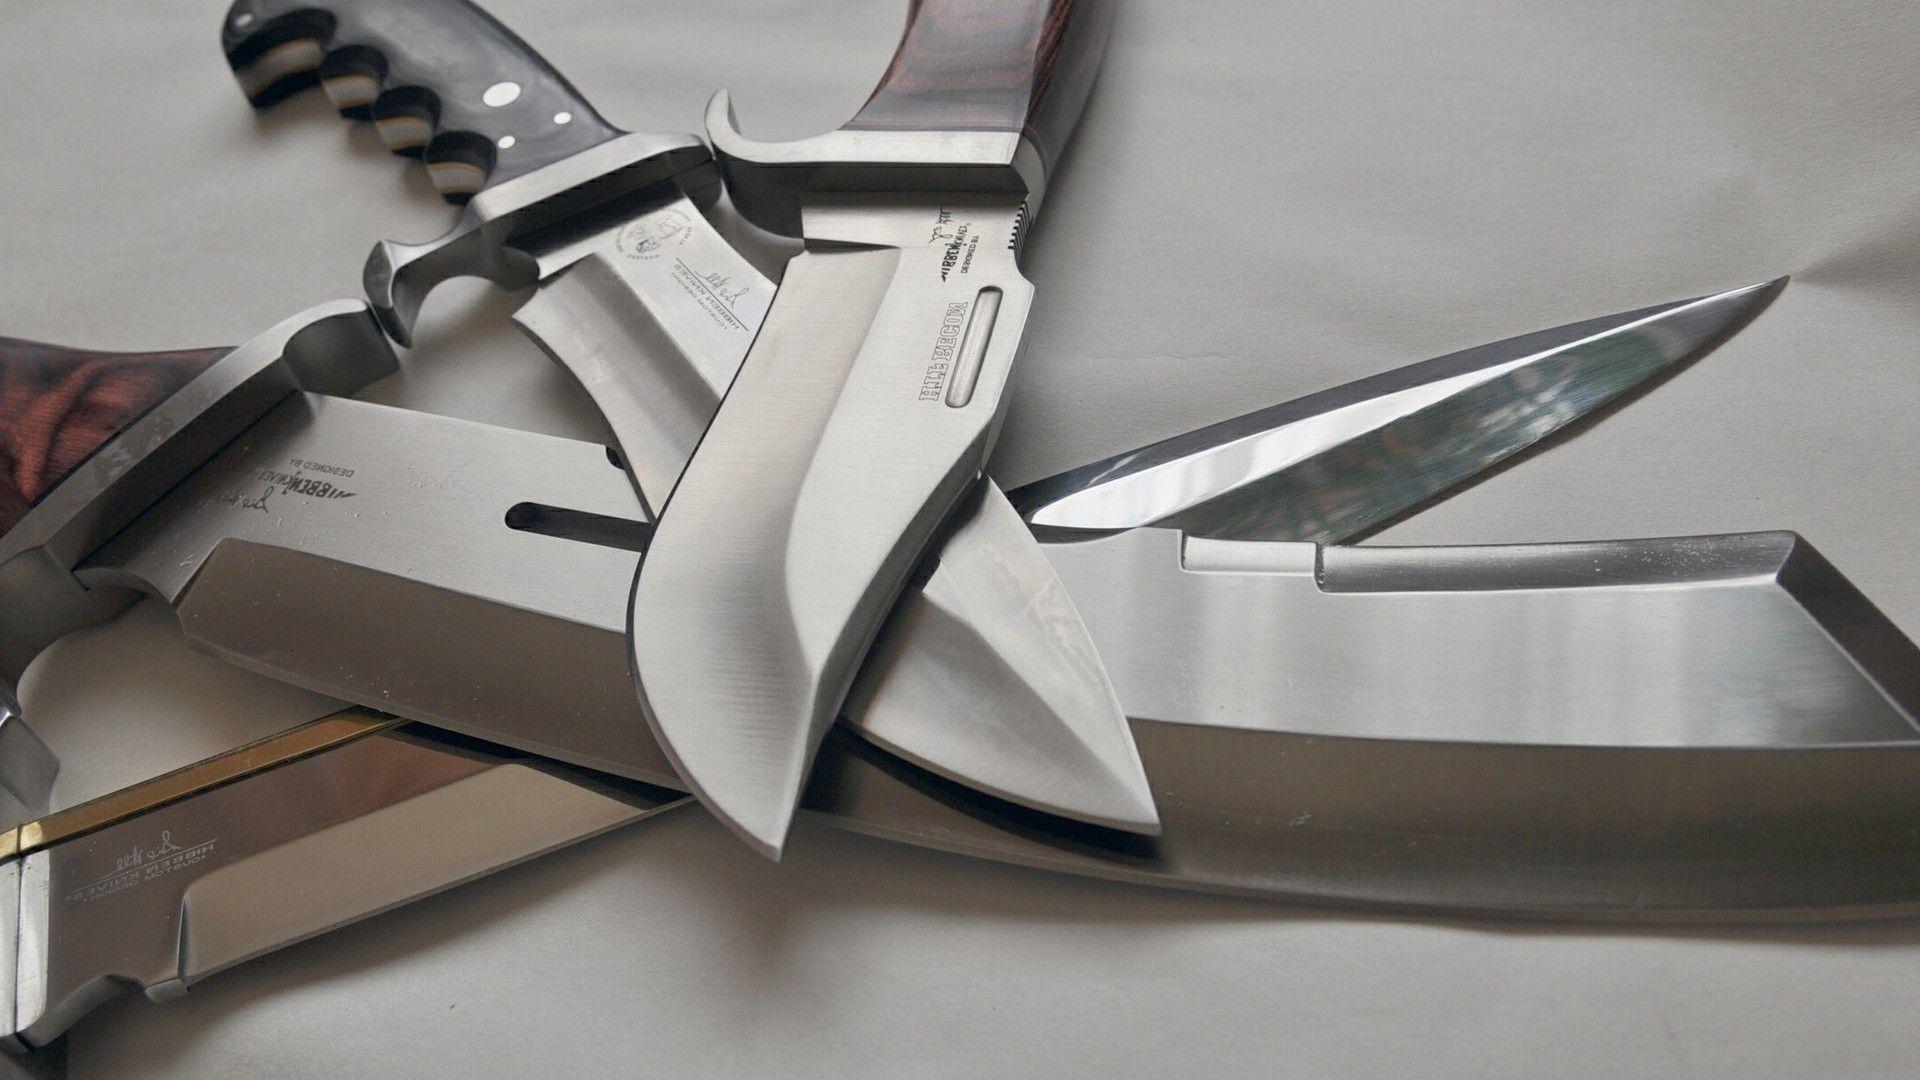 Knife screen wallpaper